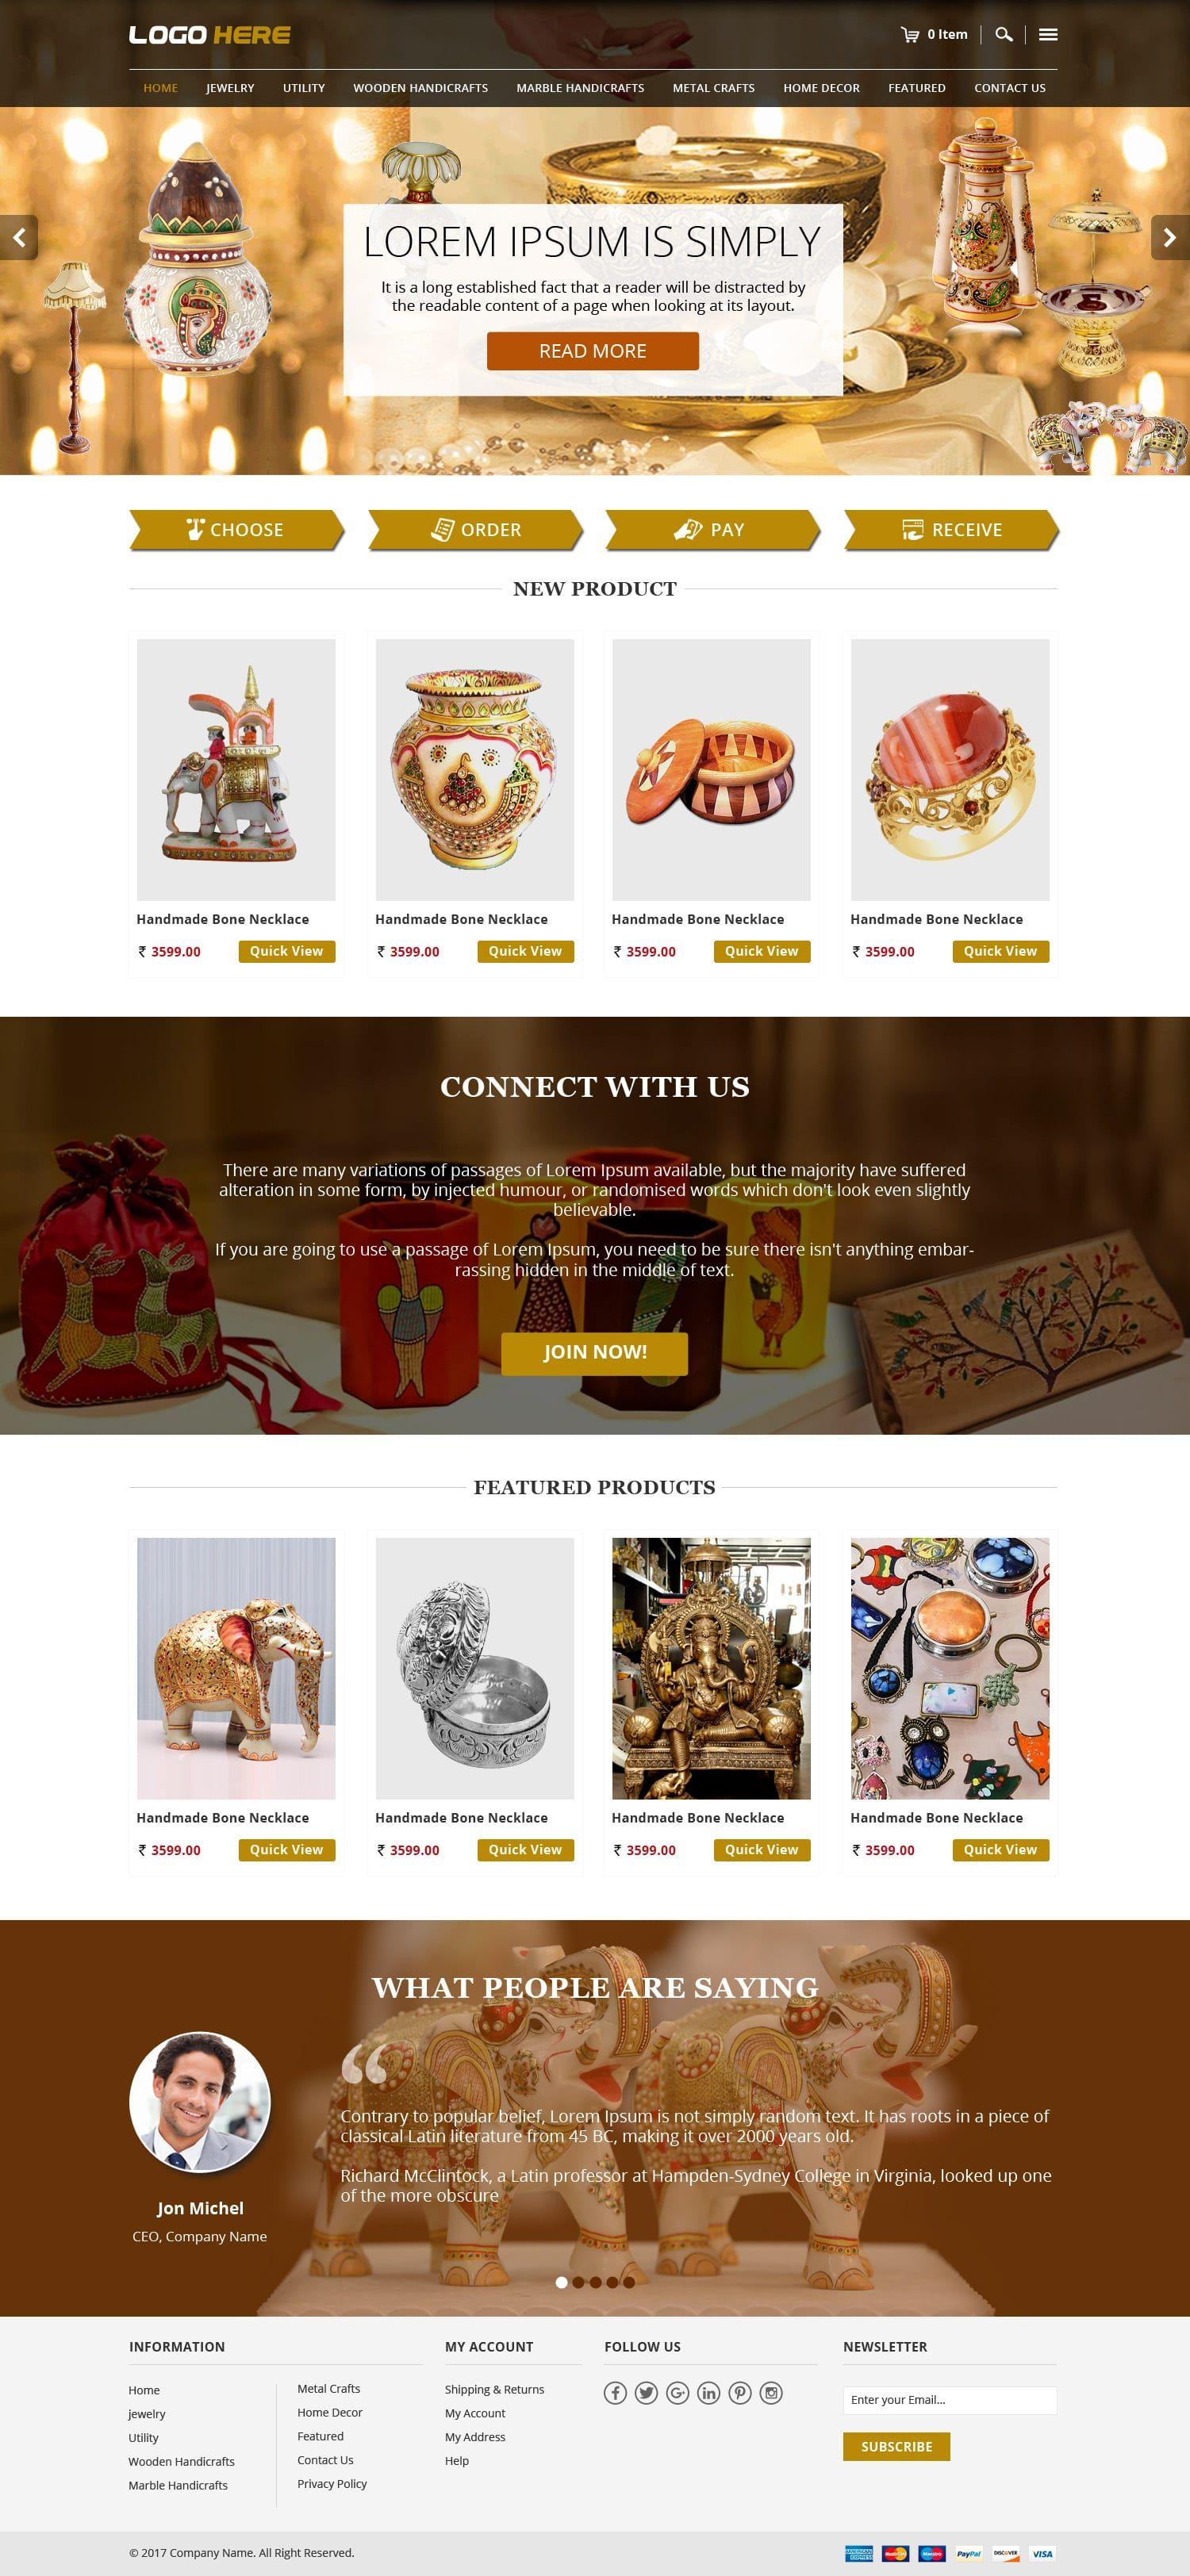 Handicraft E Commerce Website Theme Template Free Psd Design